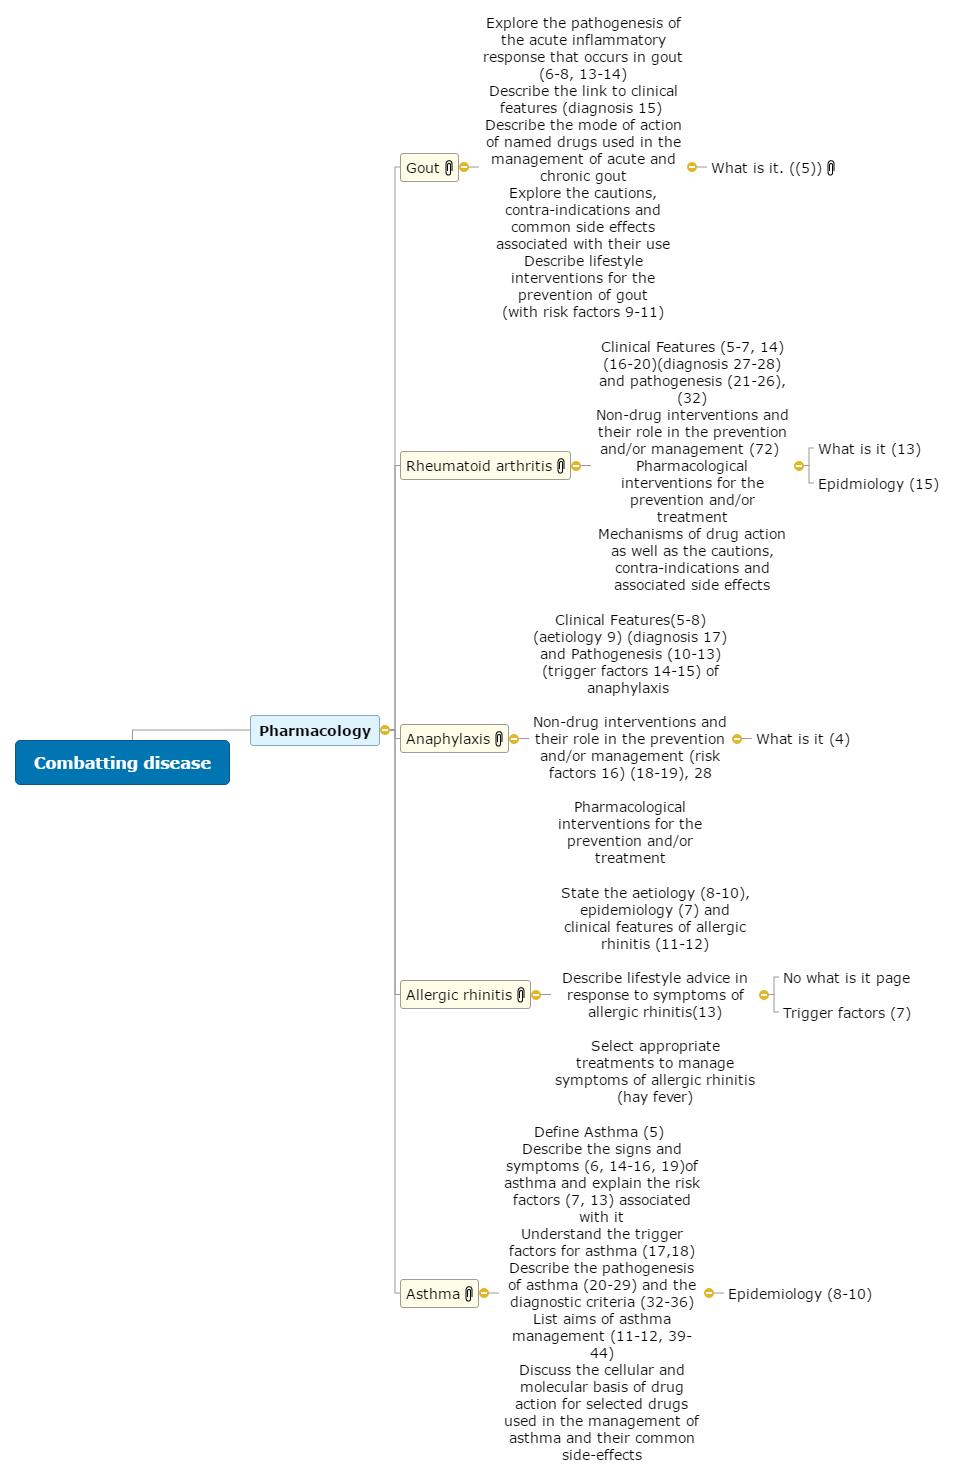 Combatting disease(15) Mind Map